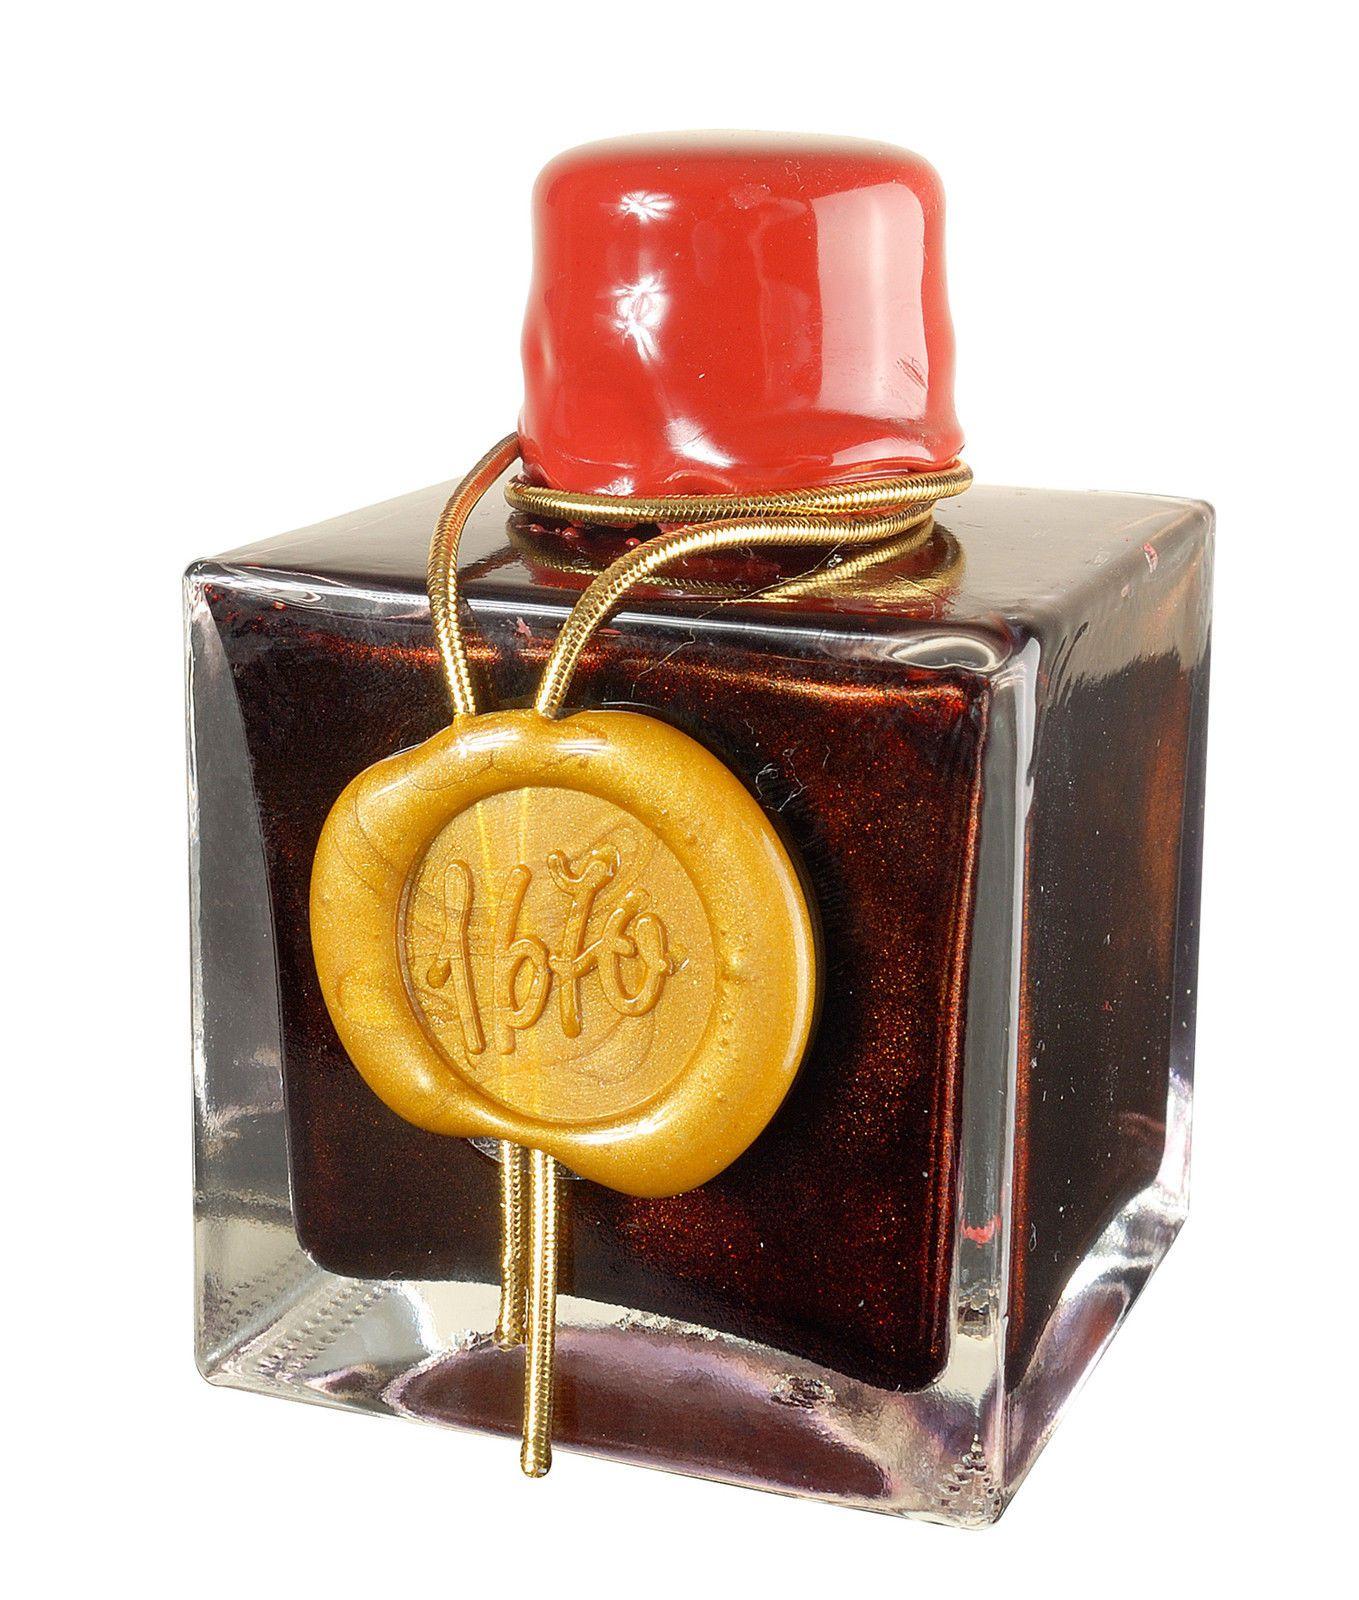 "J Herbin ""1670"" Anniversary 50 ml Bottle Fountain Pen Ink Dark Red | eBay"